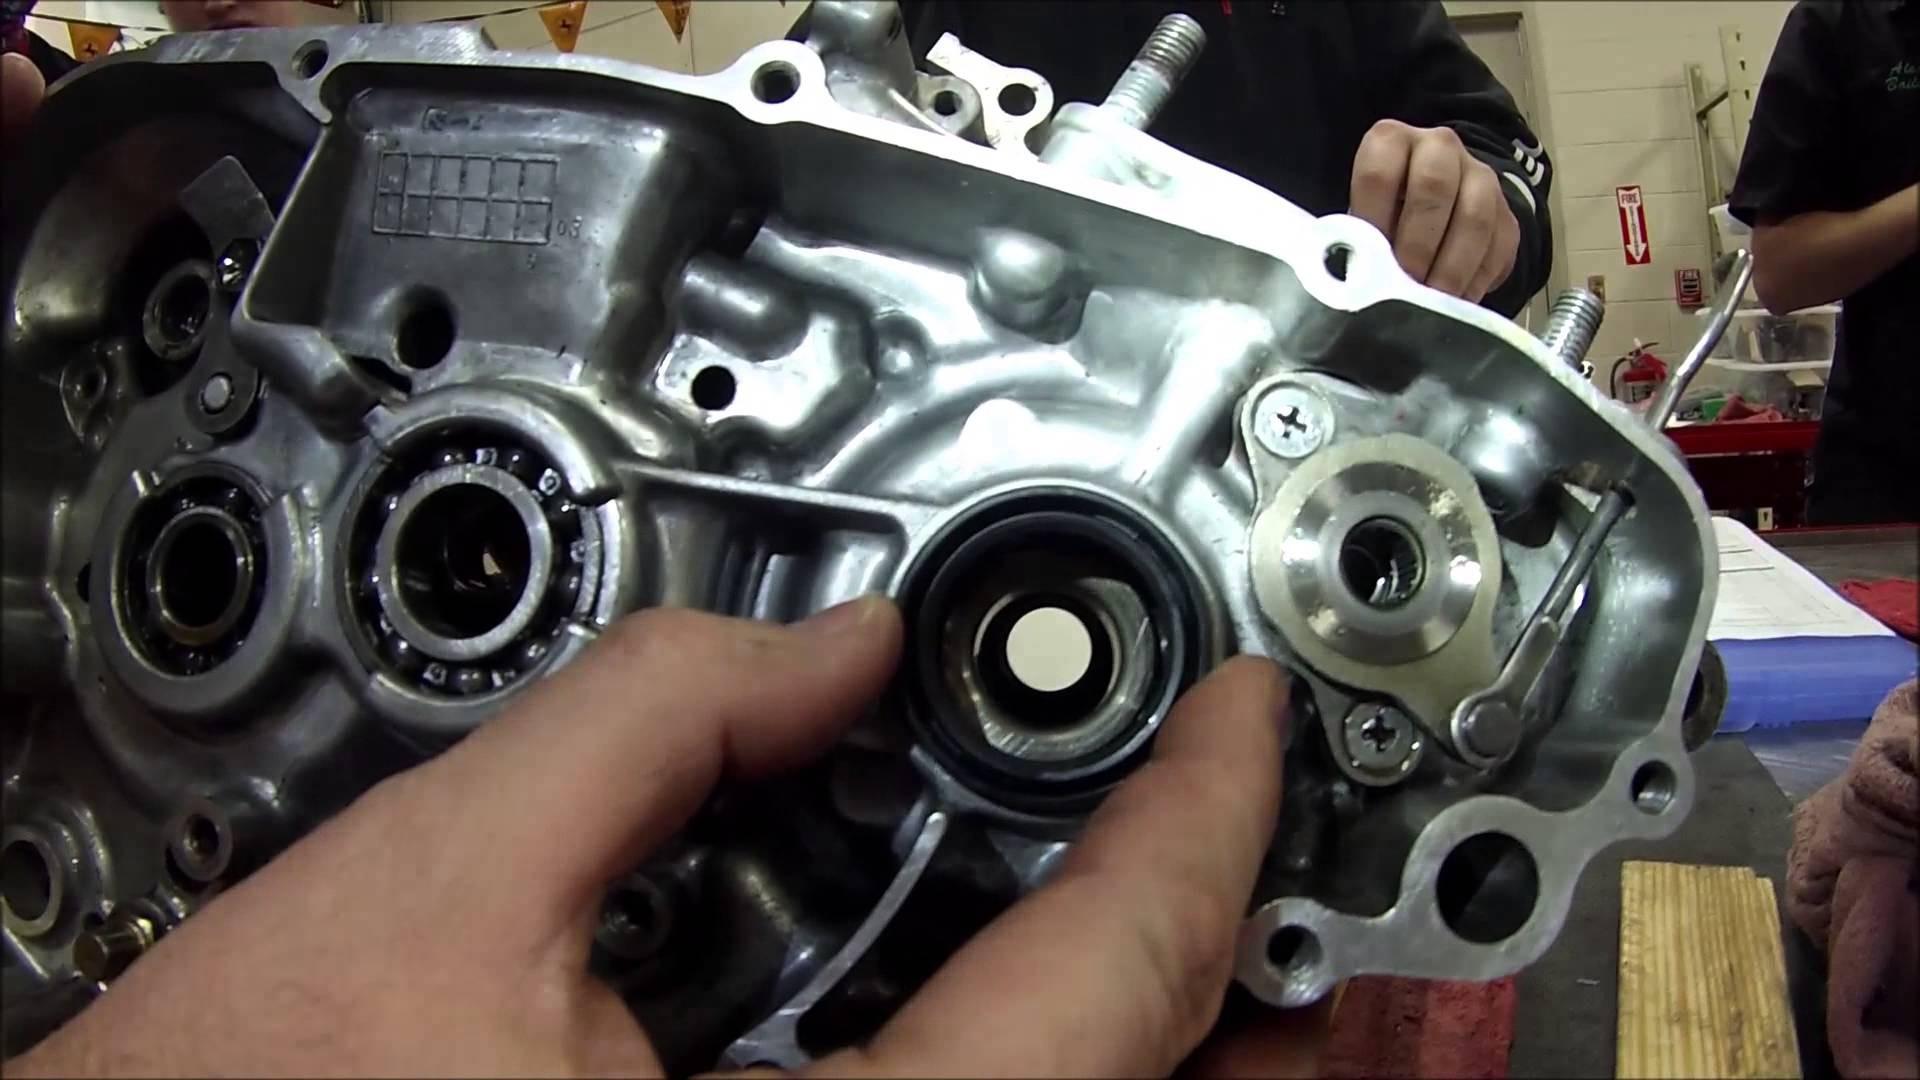 Yamaha 125z Engine Diagram Every Mechanic Series How to Install Crankshaft Transmission Oil Of Yamaha 125z Engine Diagram